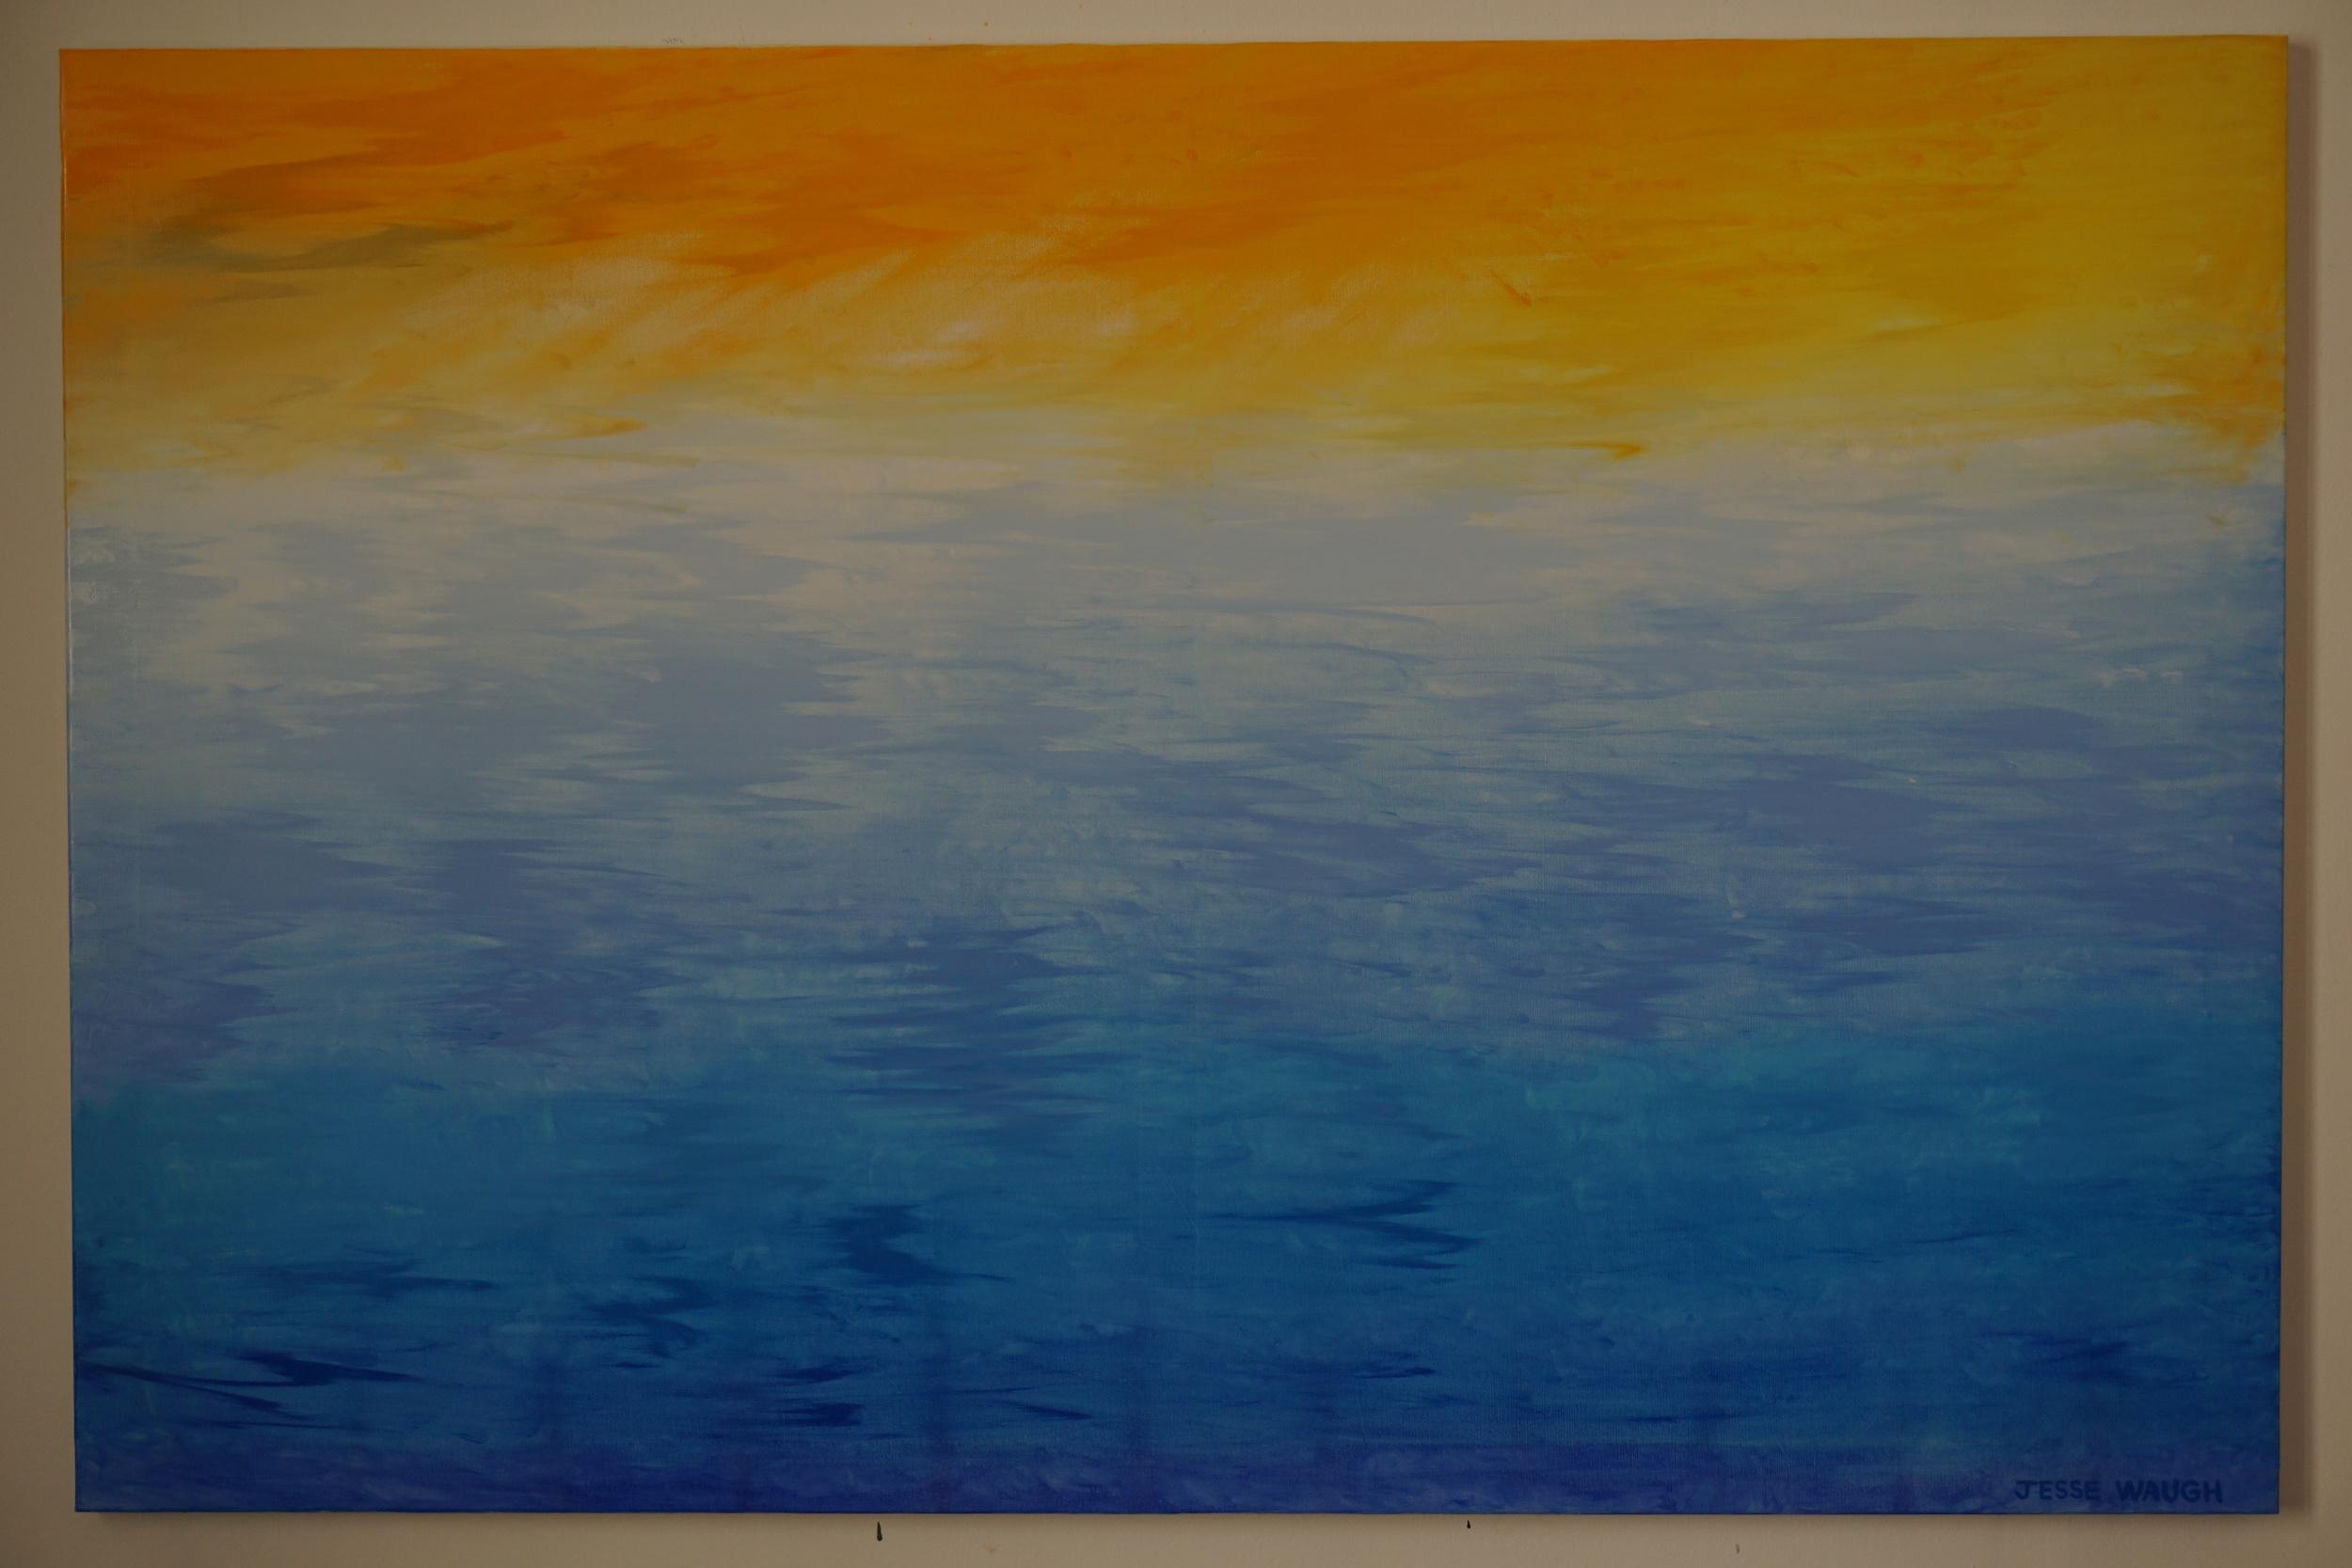 Imminent-Horizon-JESSE-WAUGH-jessewaugh.com-ORIGINAL.JPG